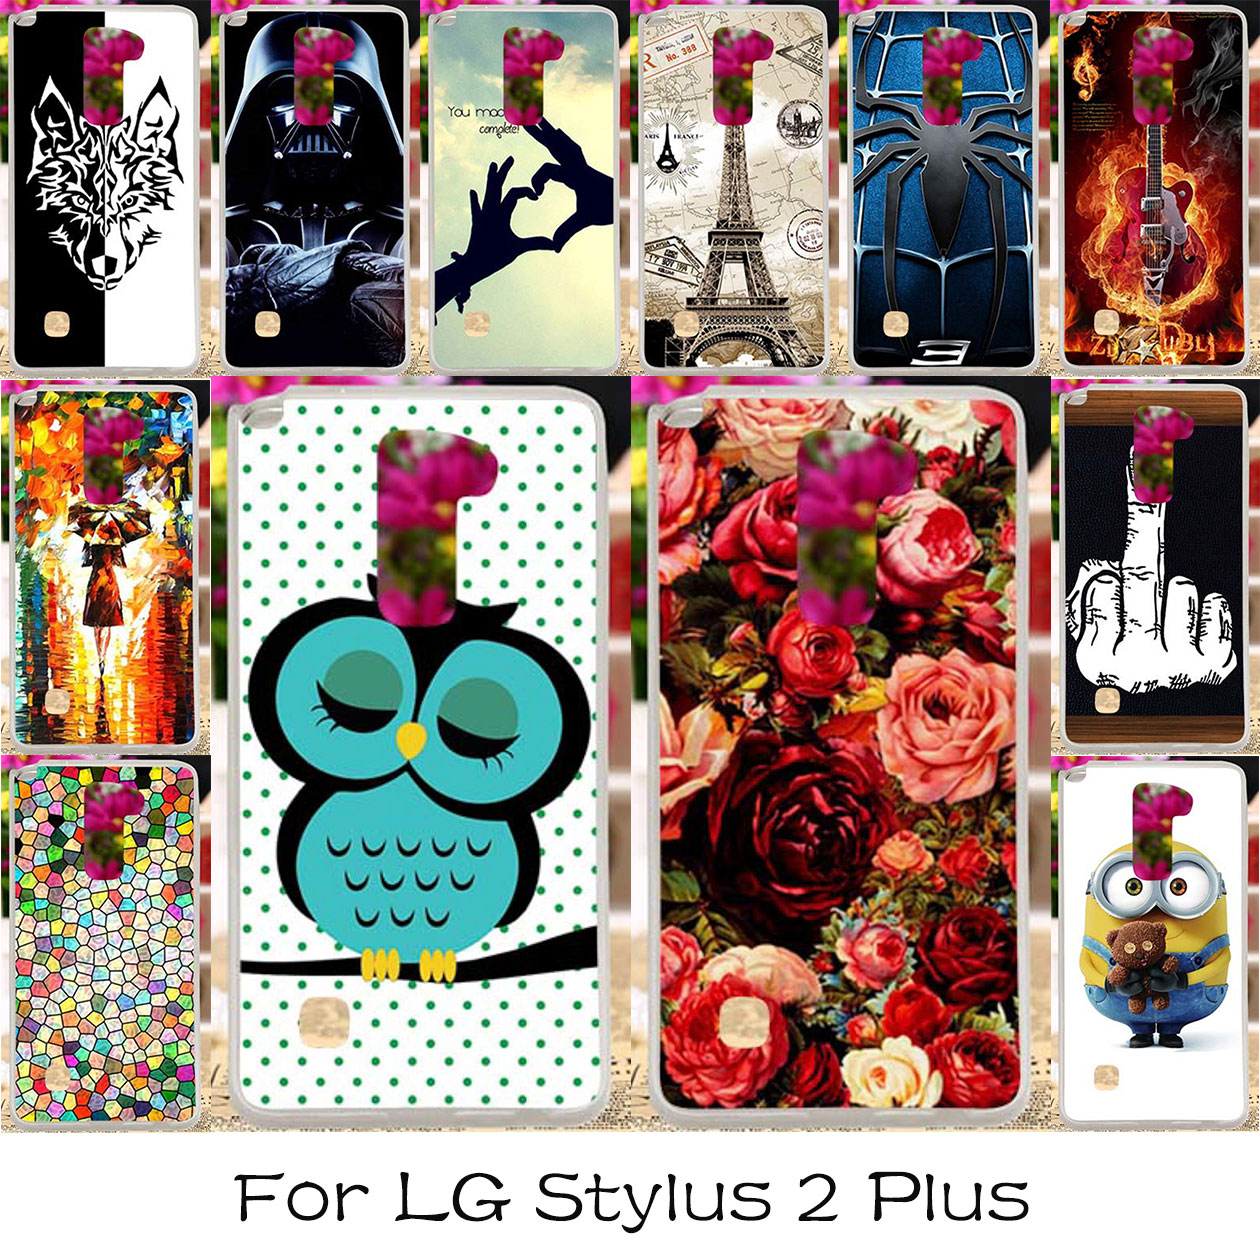 TAOYUNXI Silicon Plastic Phone Cover Case For LG Stylus 2 Plus F720 LS775 K530 K535 G Stylo 2 K520 Stylus2 Stylus Covers Shell